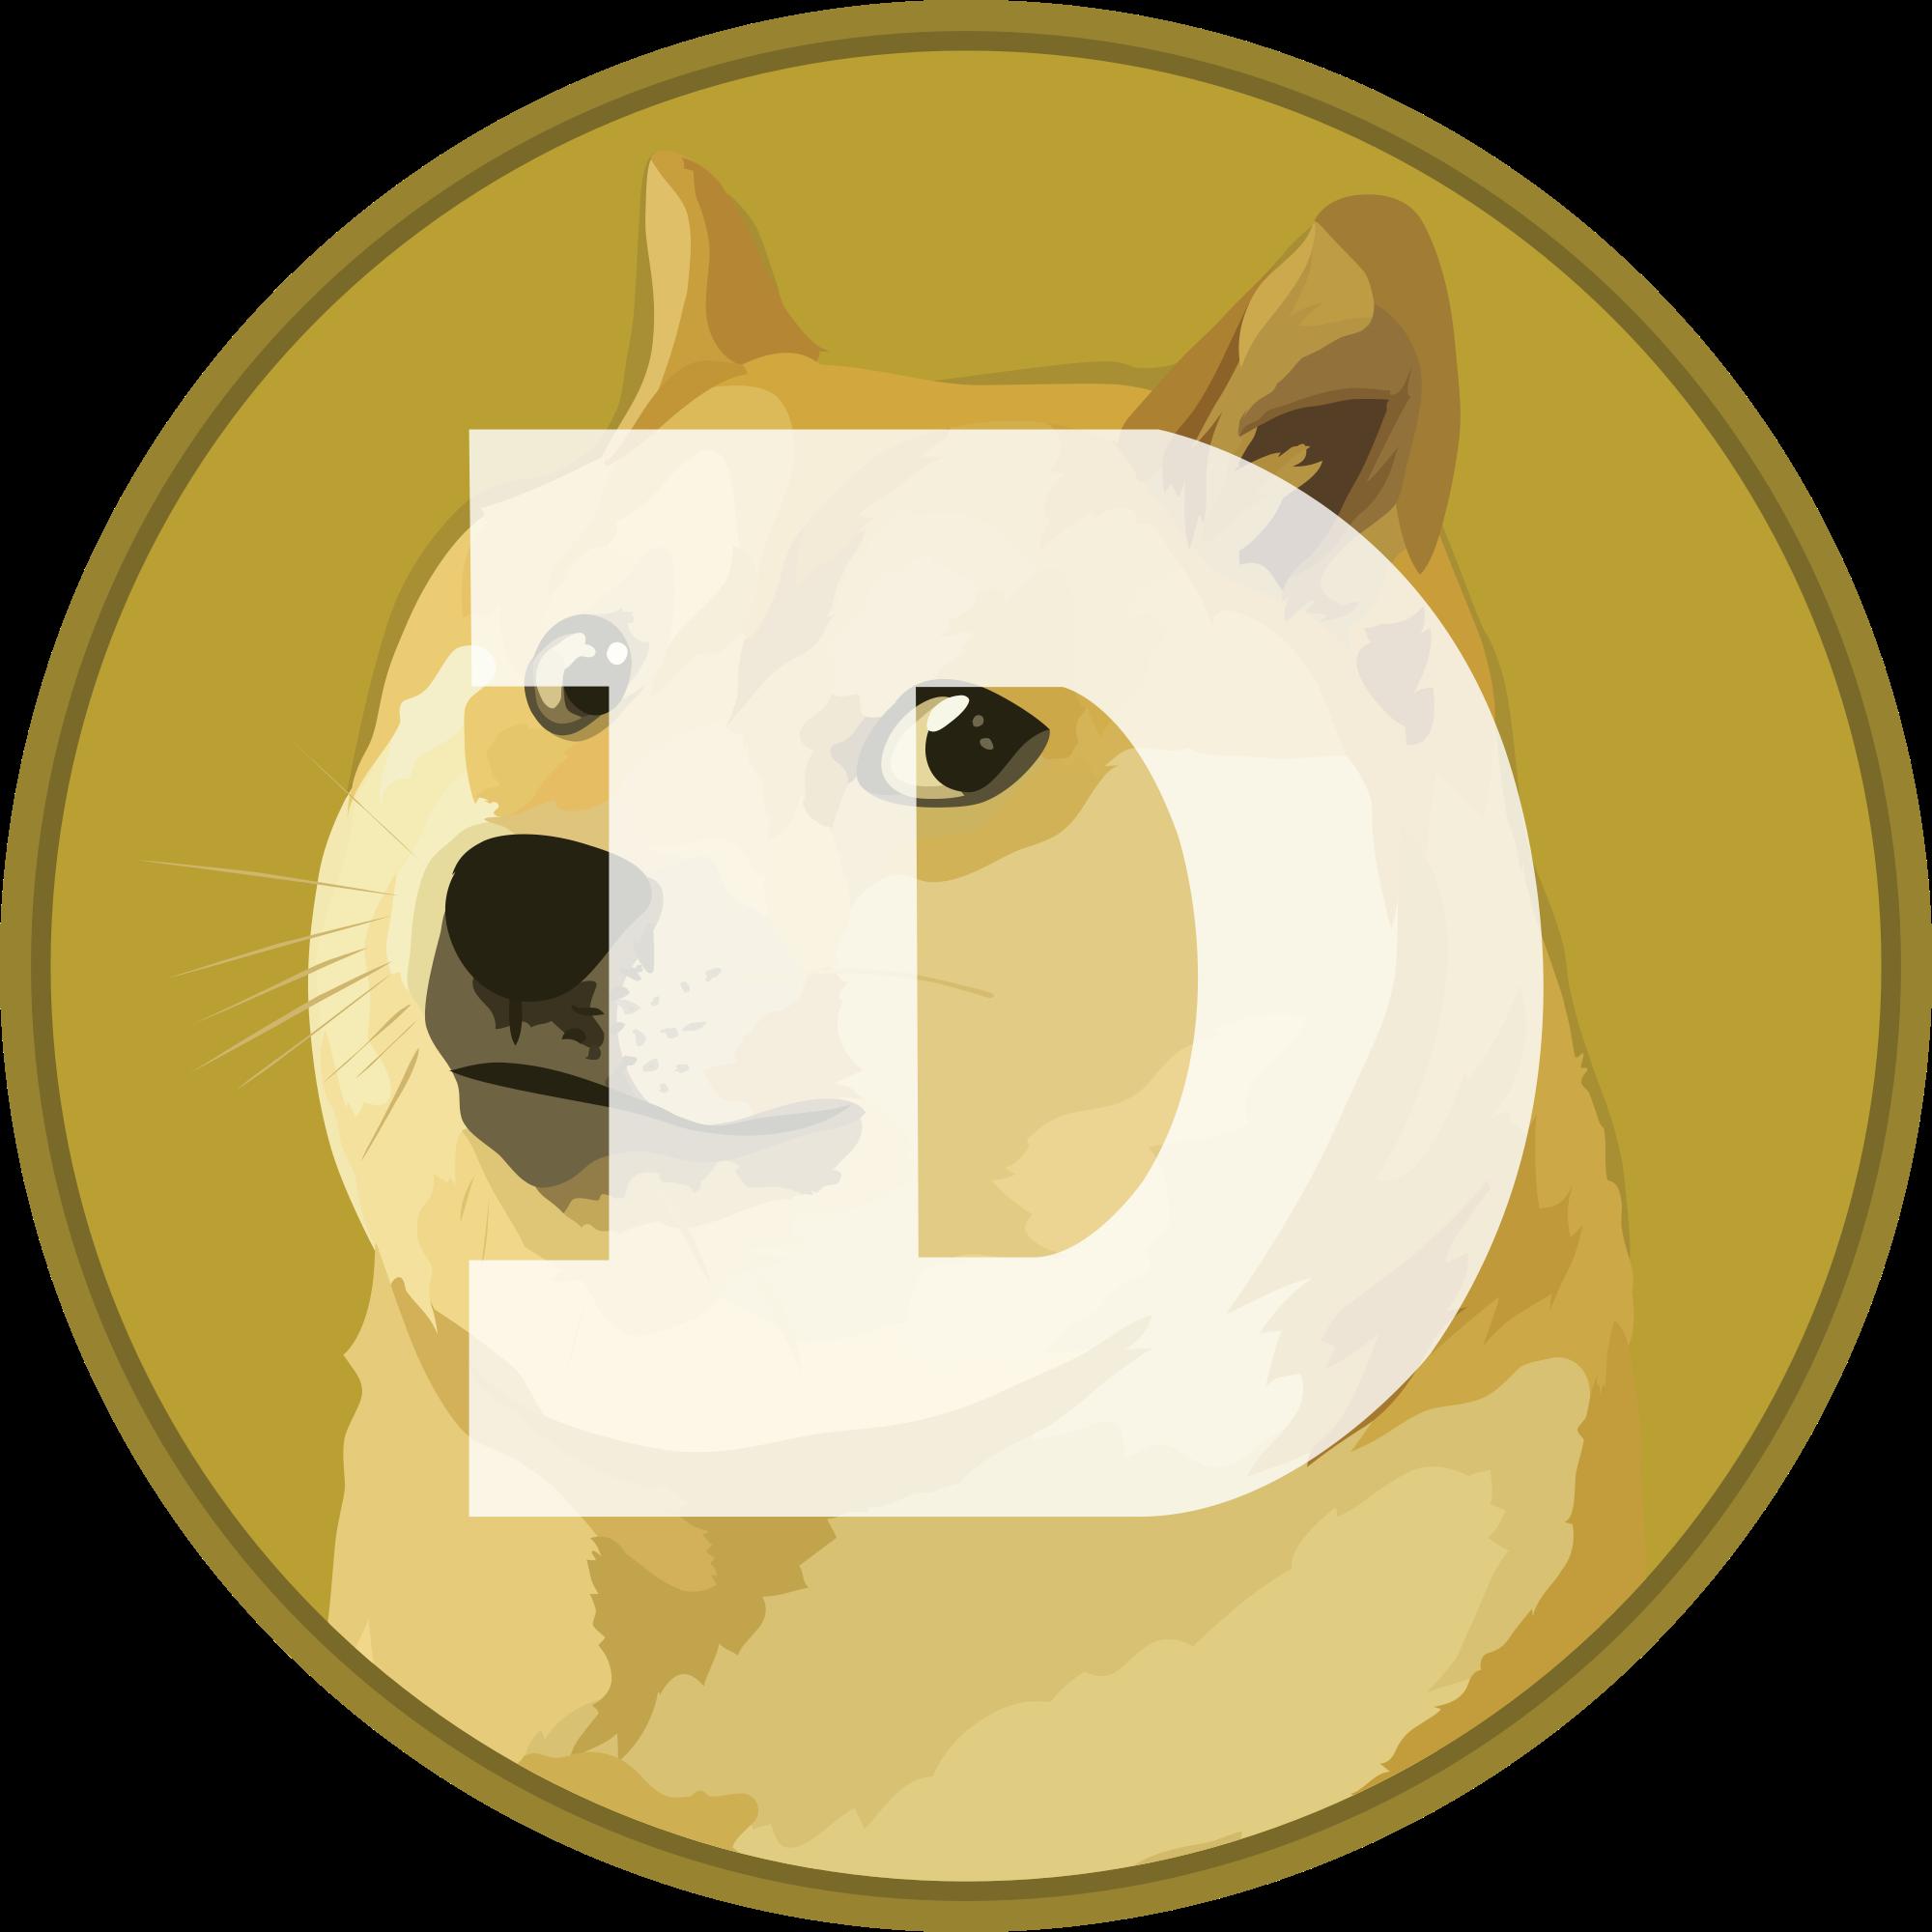 Dogecoin (DOGE) Logo .SVG and .PNG Files Download